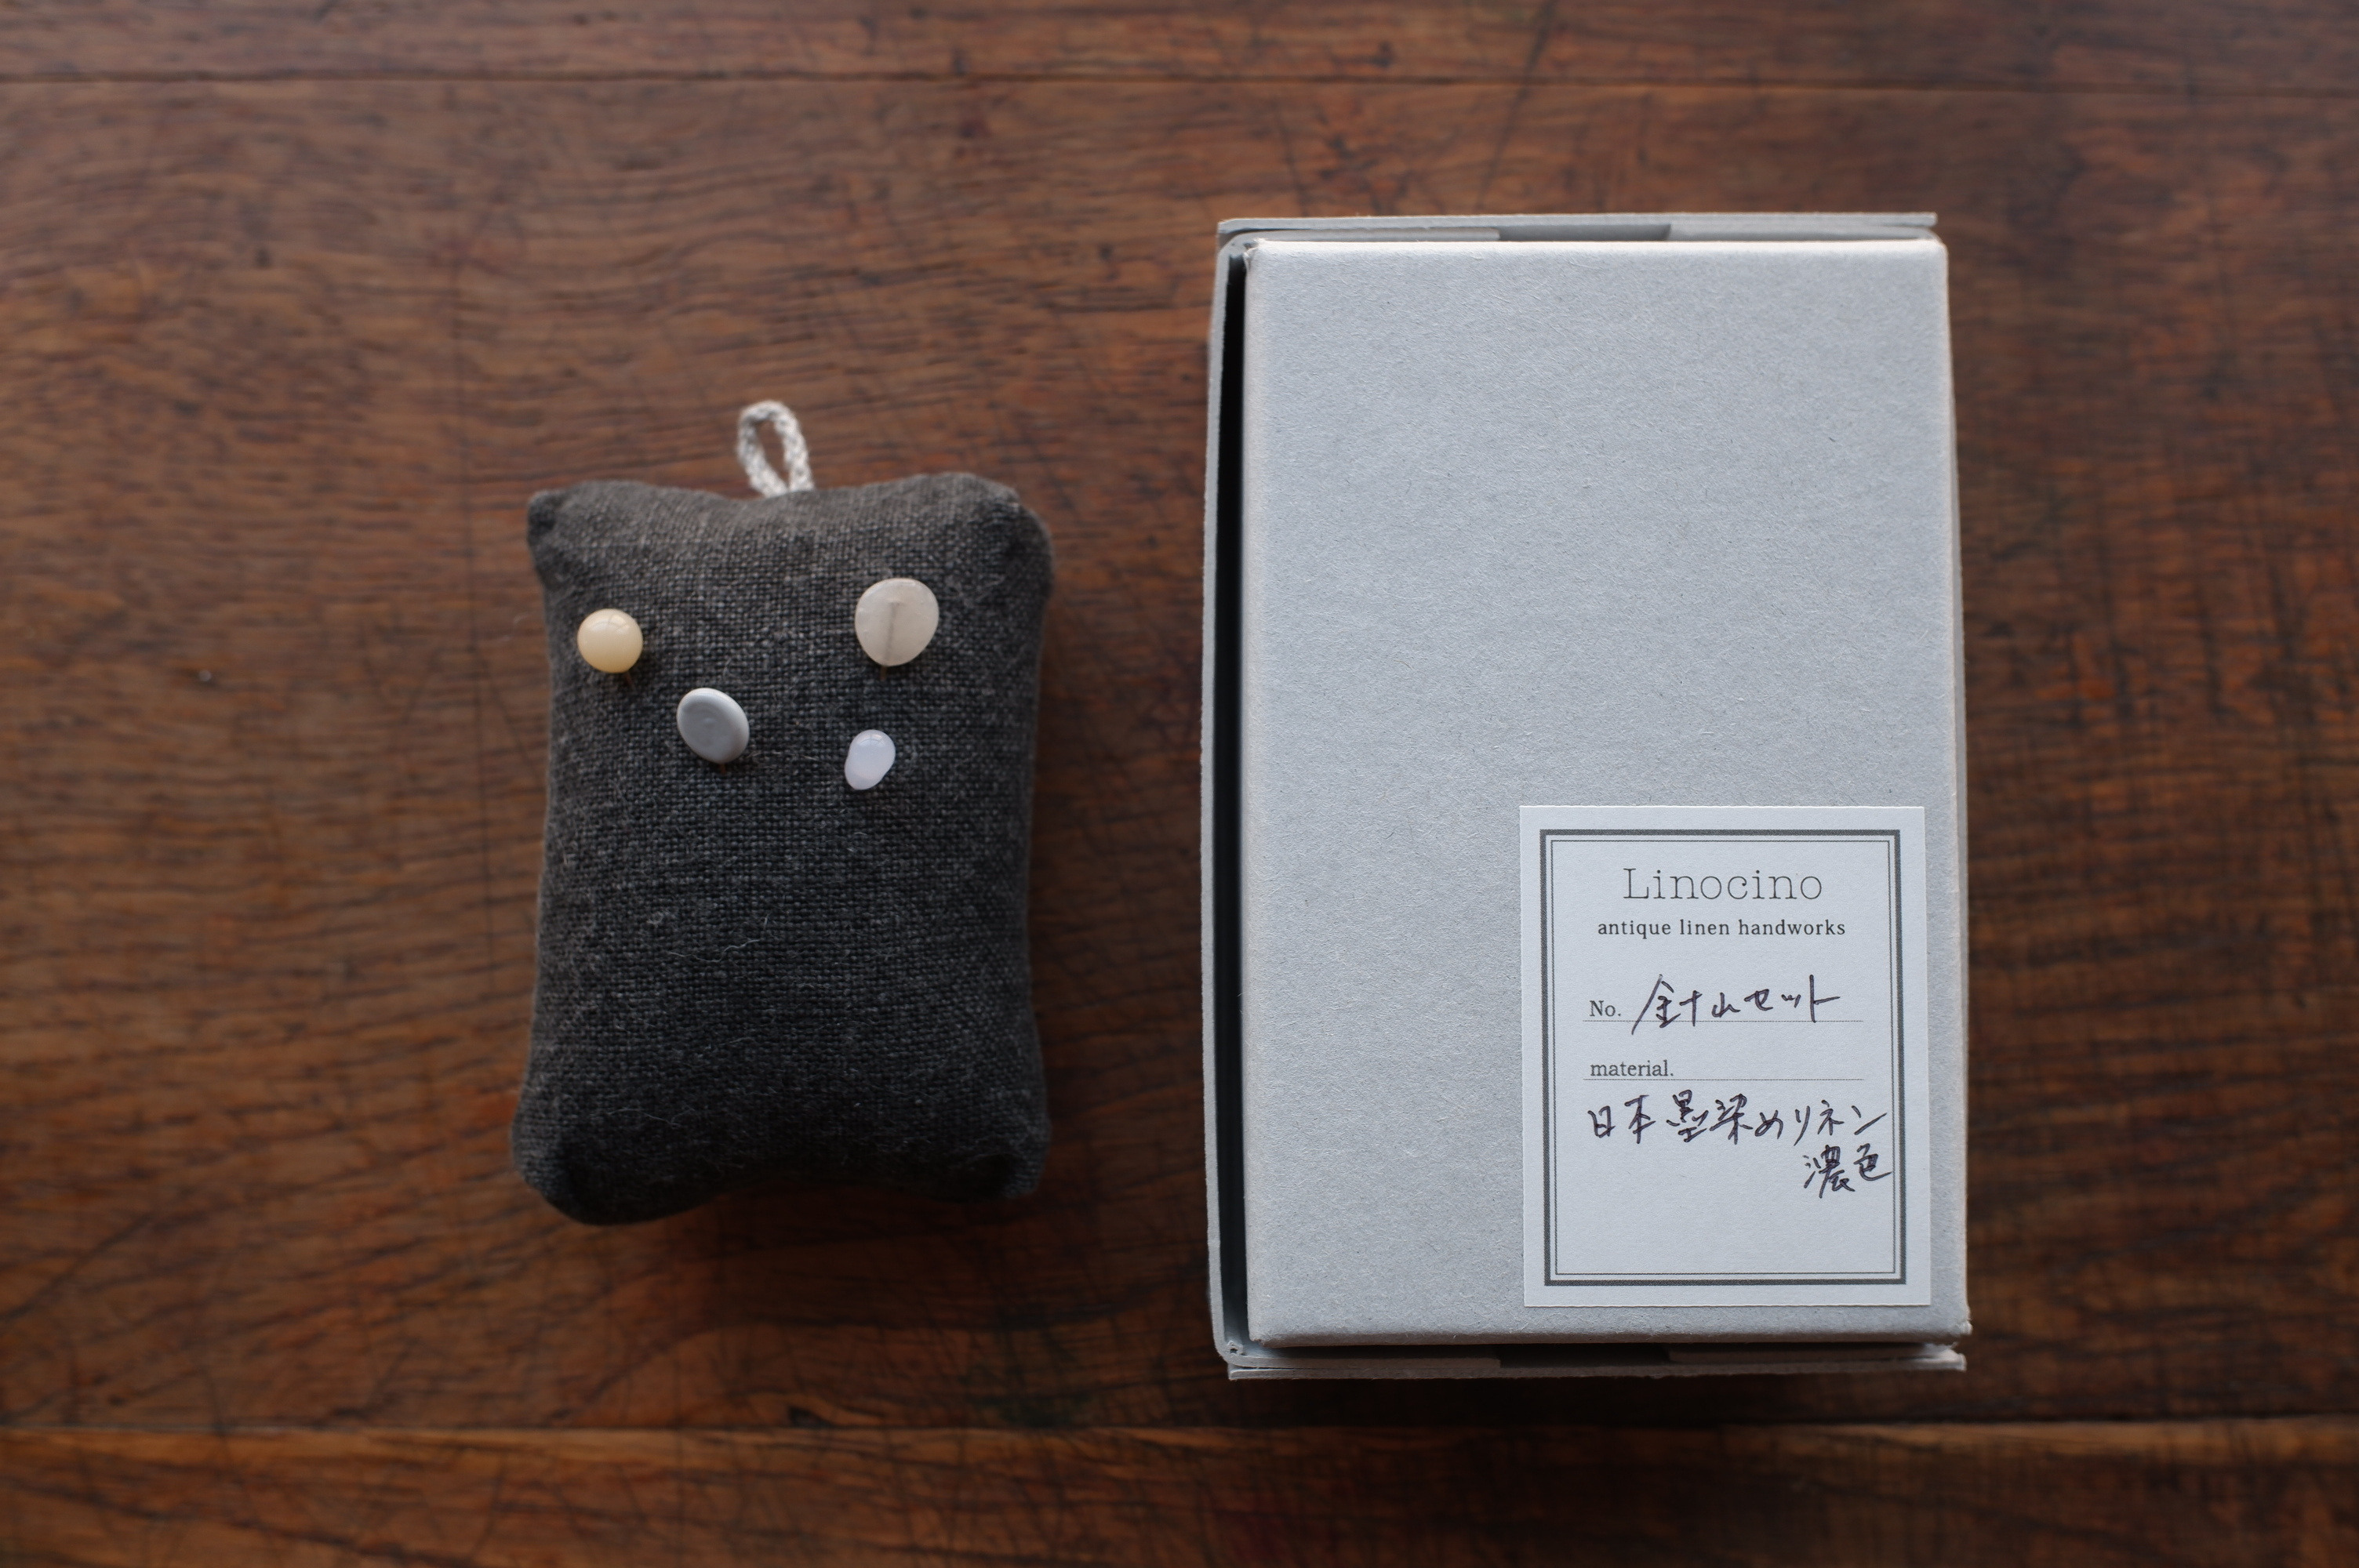 Linocino  針山セット BOX入り 日本黒染めリネン